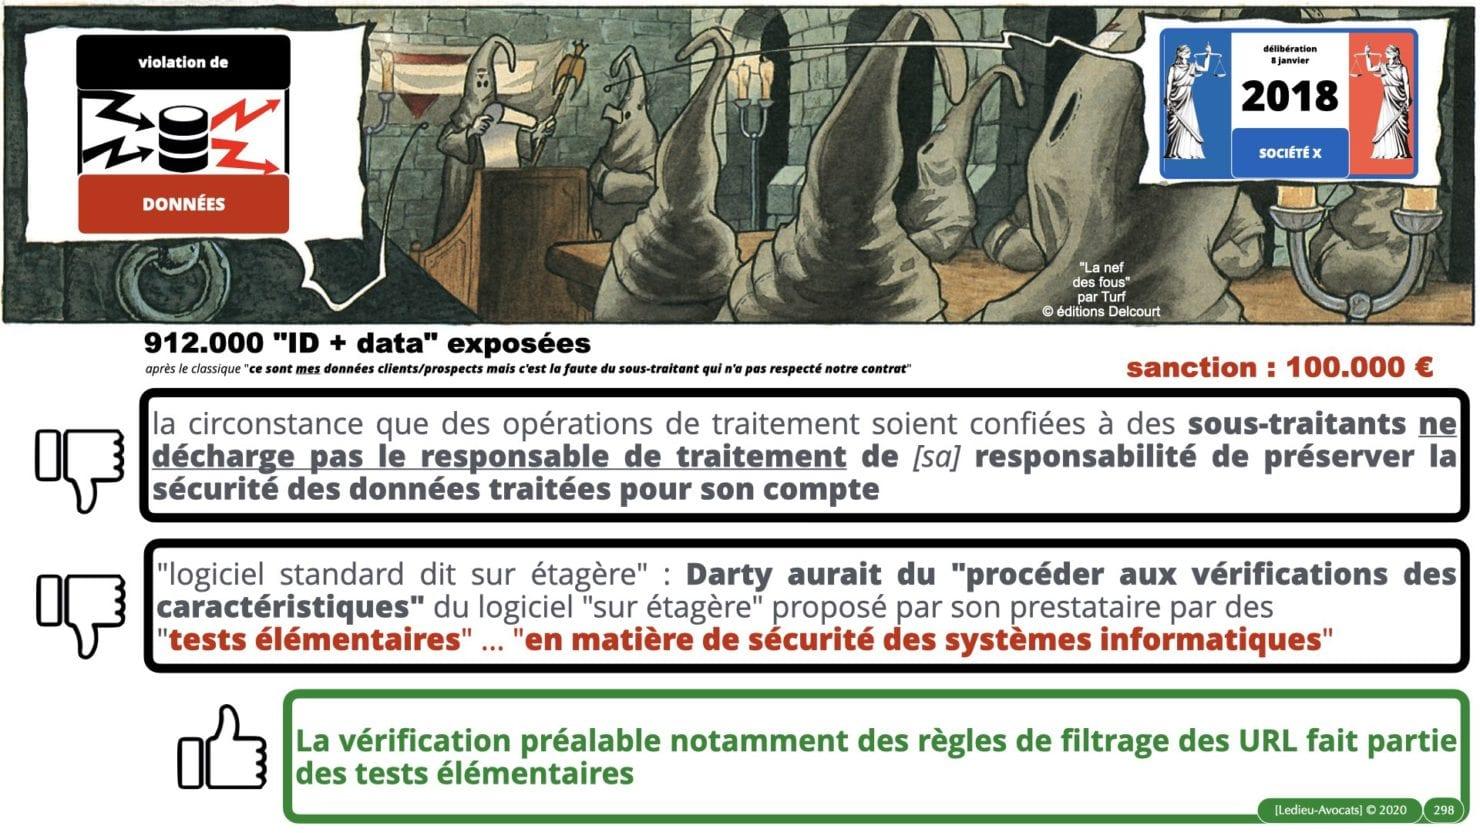 RGPD e-Privacy principes actualité jurisprudence ©Ledieu-Avocats 25-06-2021.298